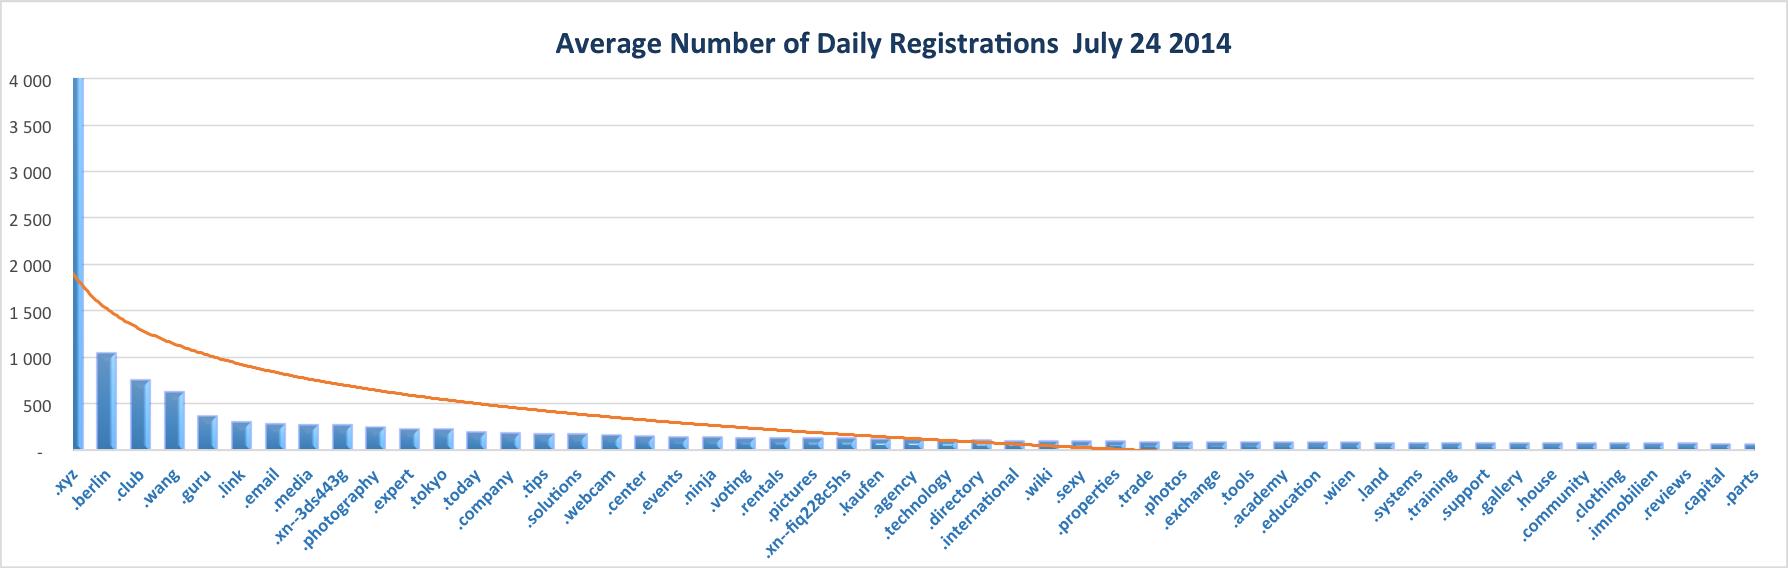 New gTLD Average Registrations Top Half July 24, 2014